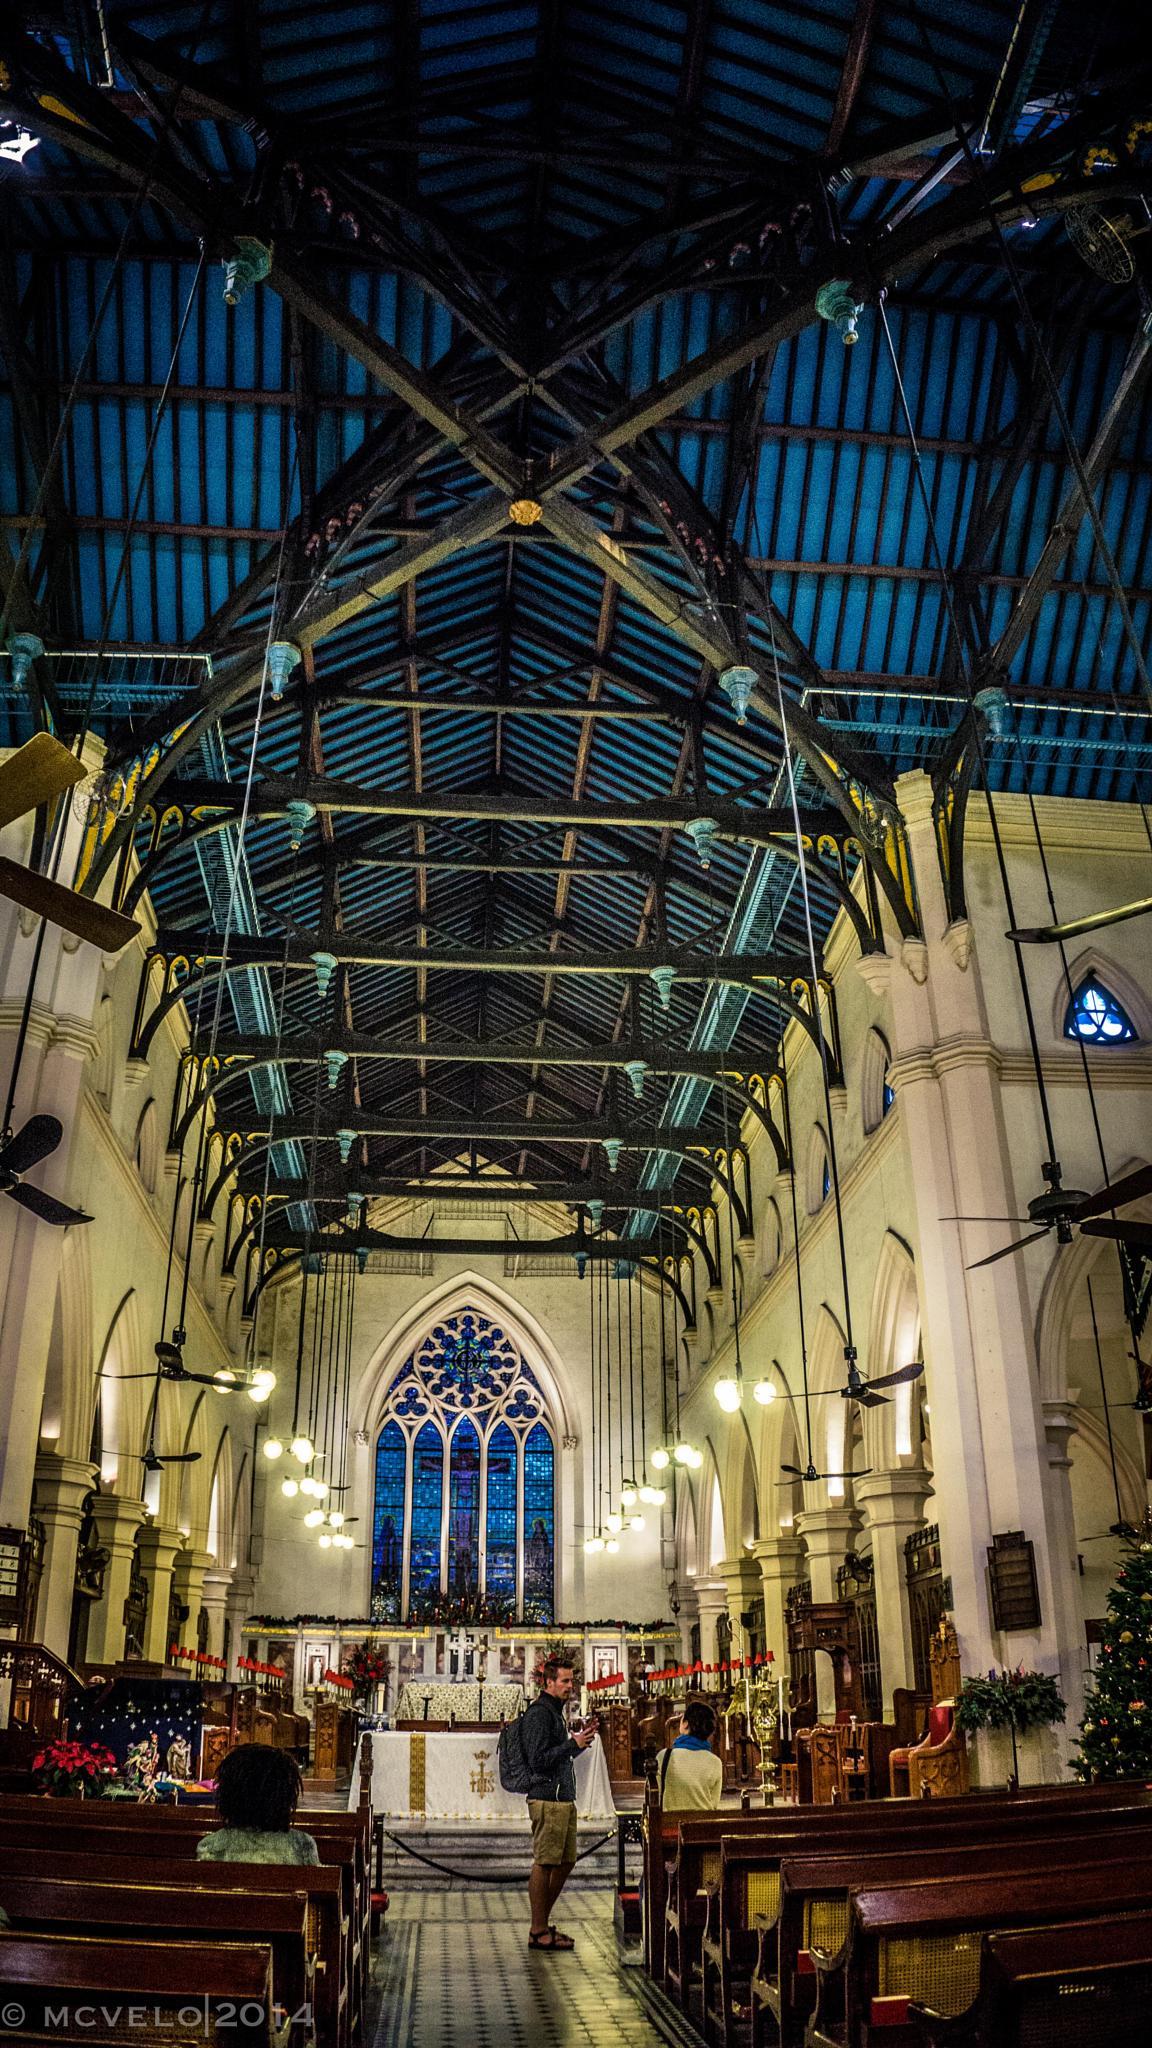 The Church by archangel88